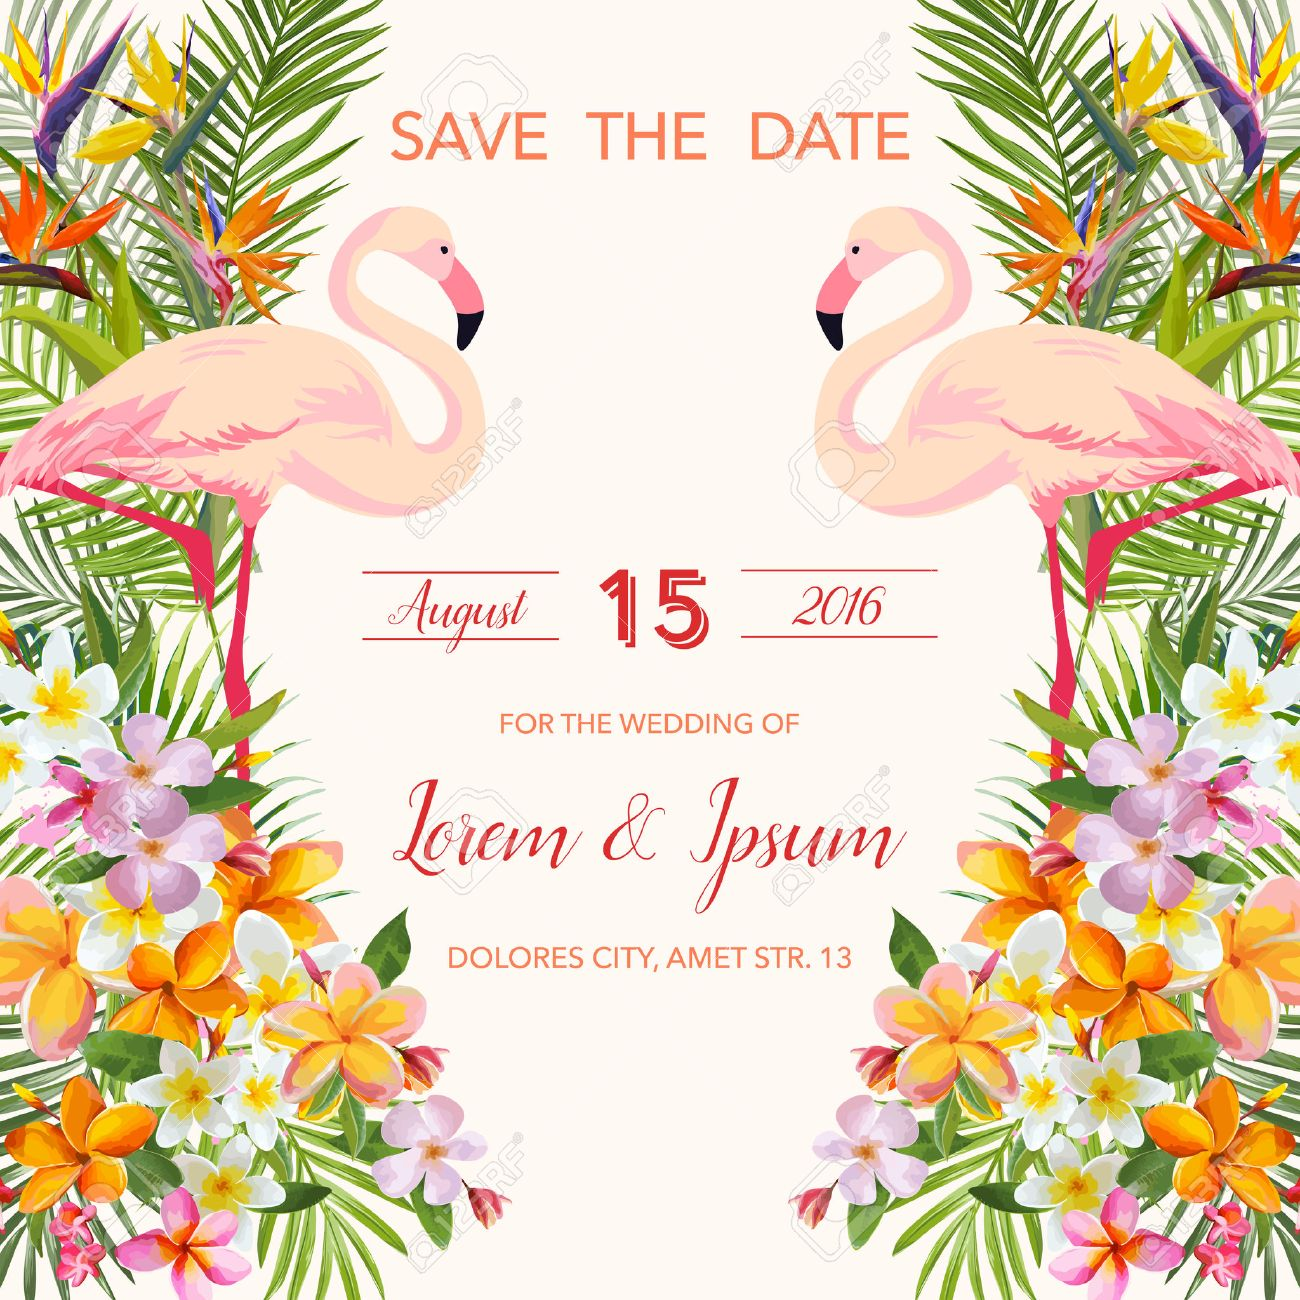 save the date wedding card tropical flowers flamingo bird